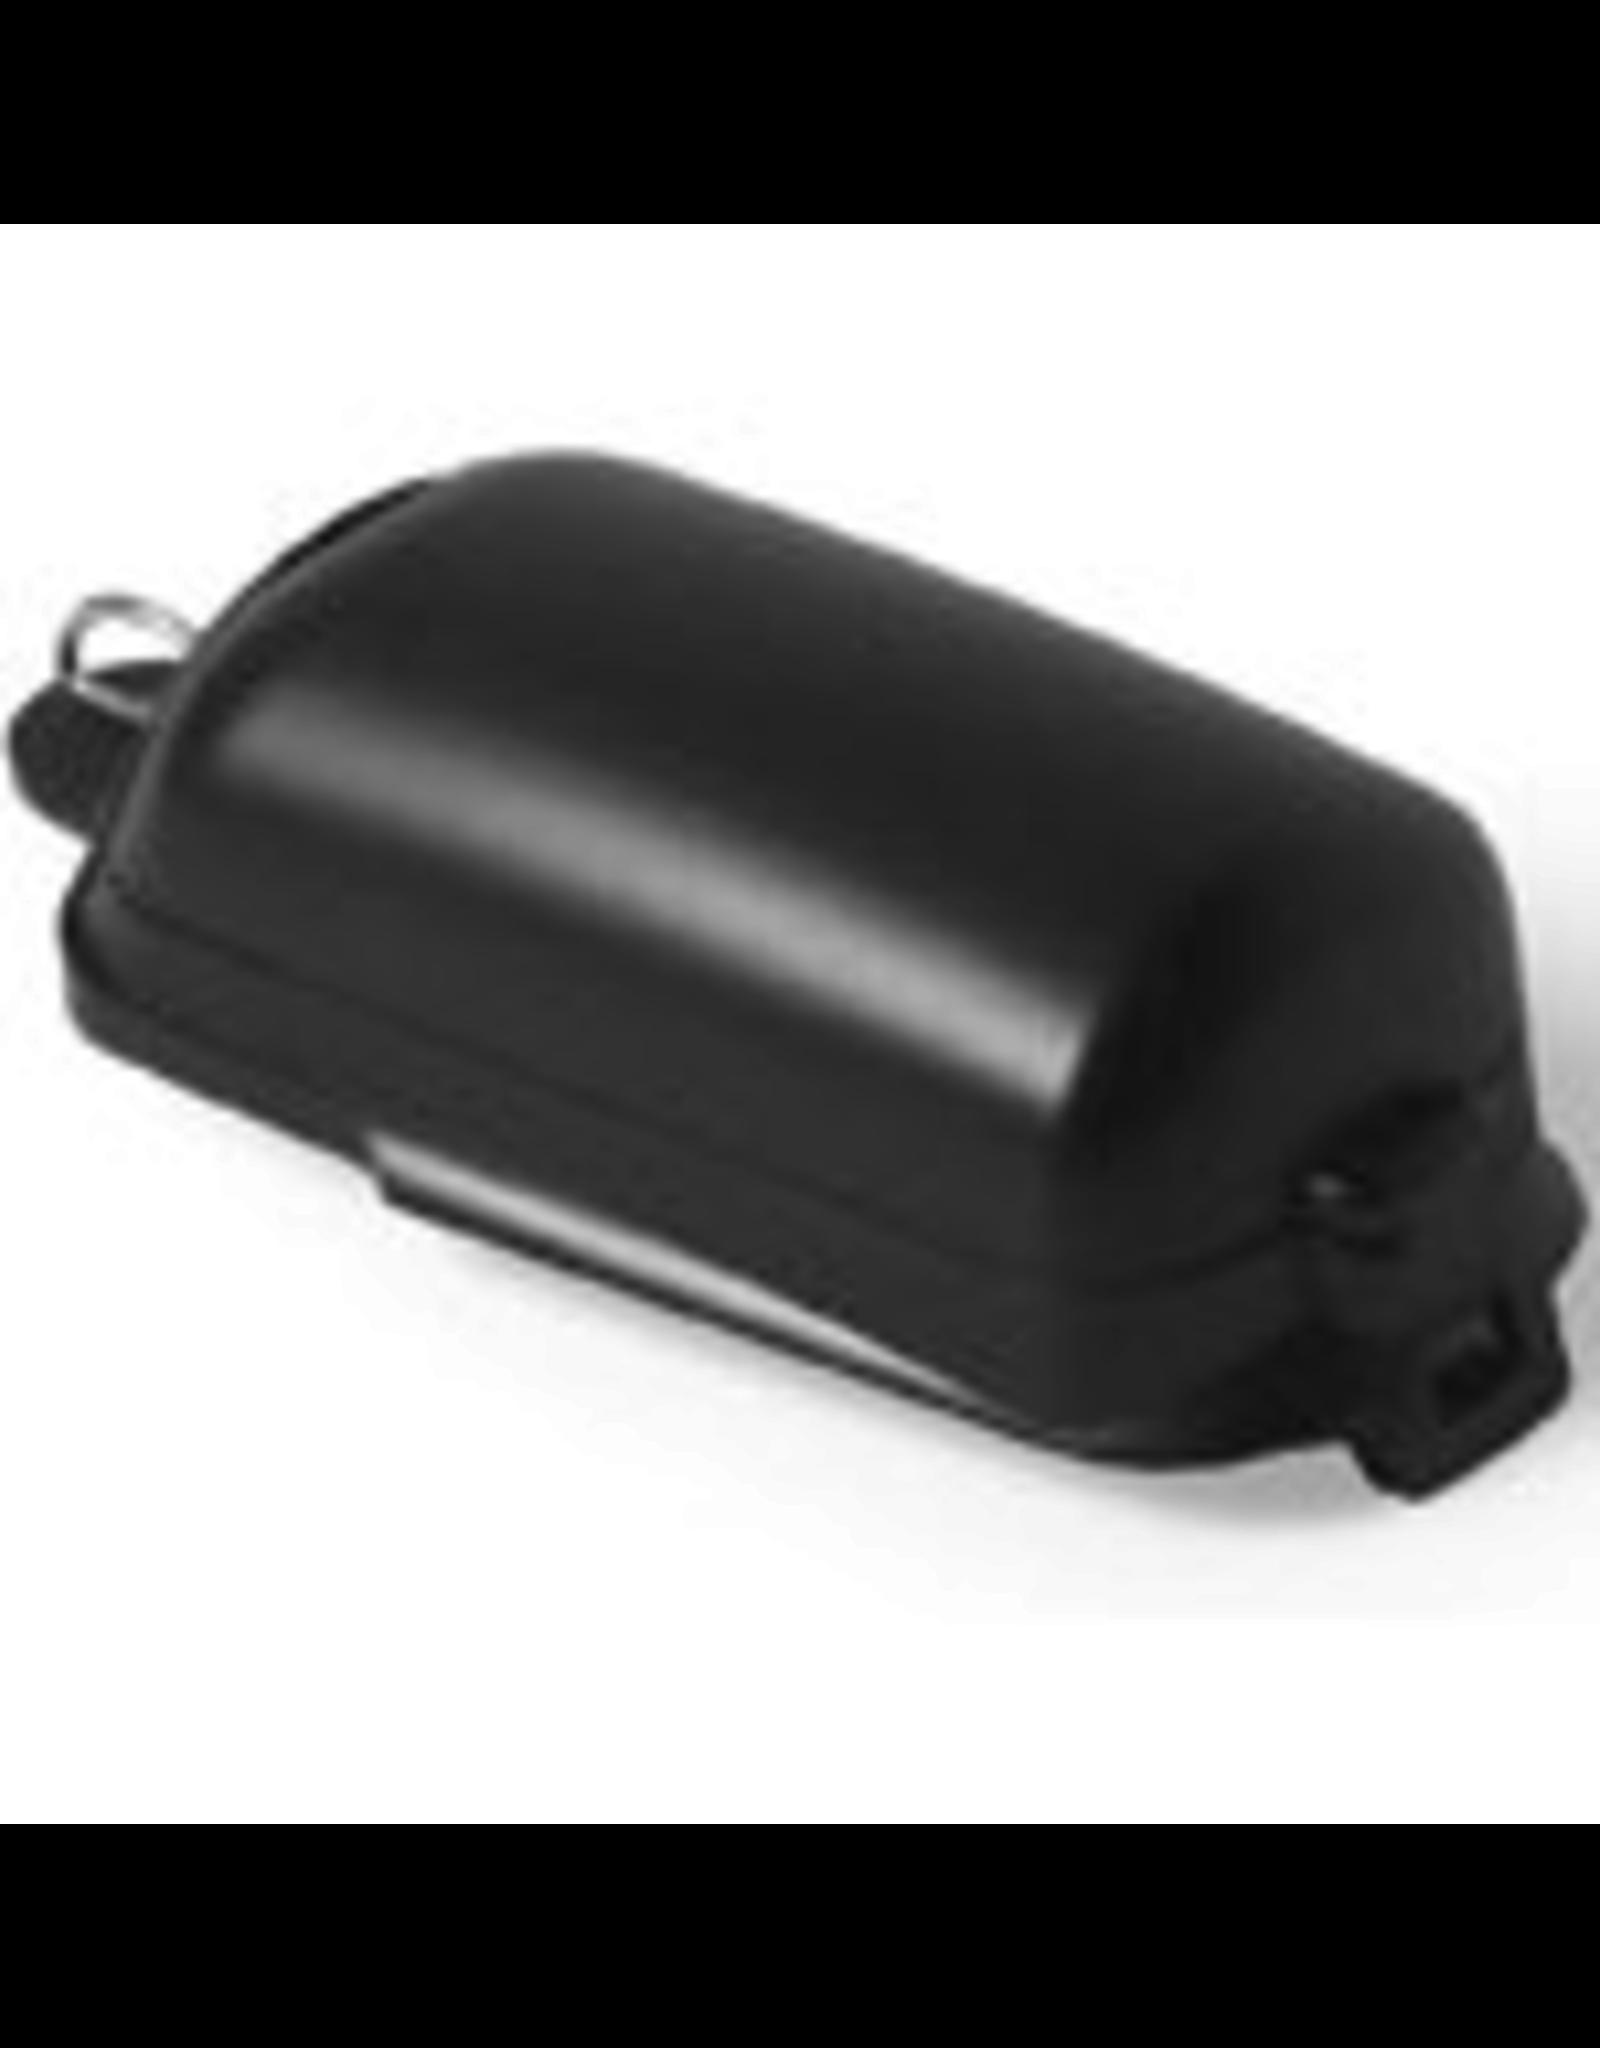 Garmin Garmin Rino 530/520 Alkaline Battery pack